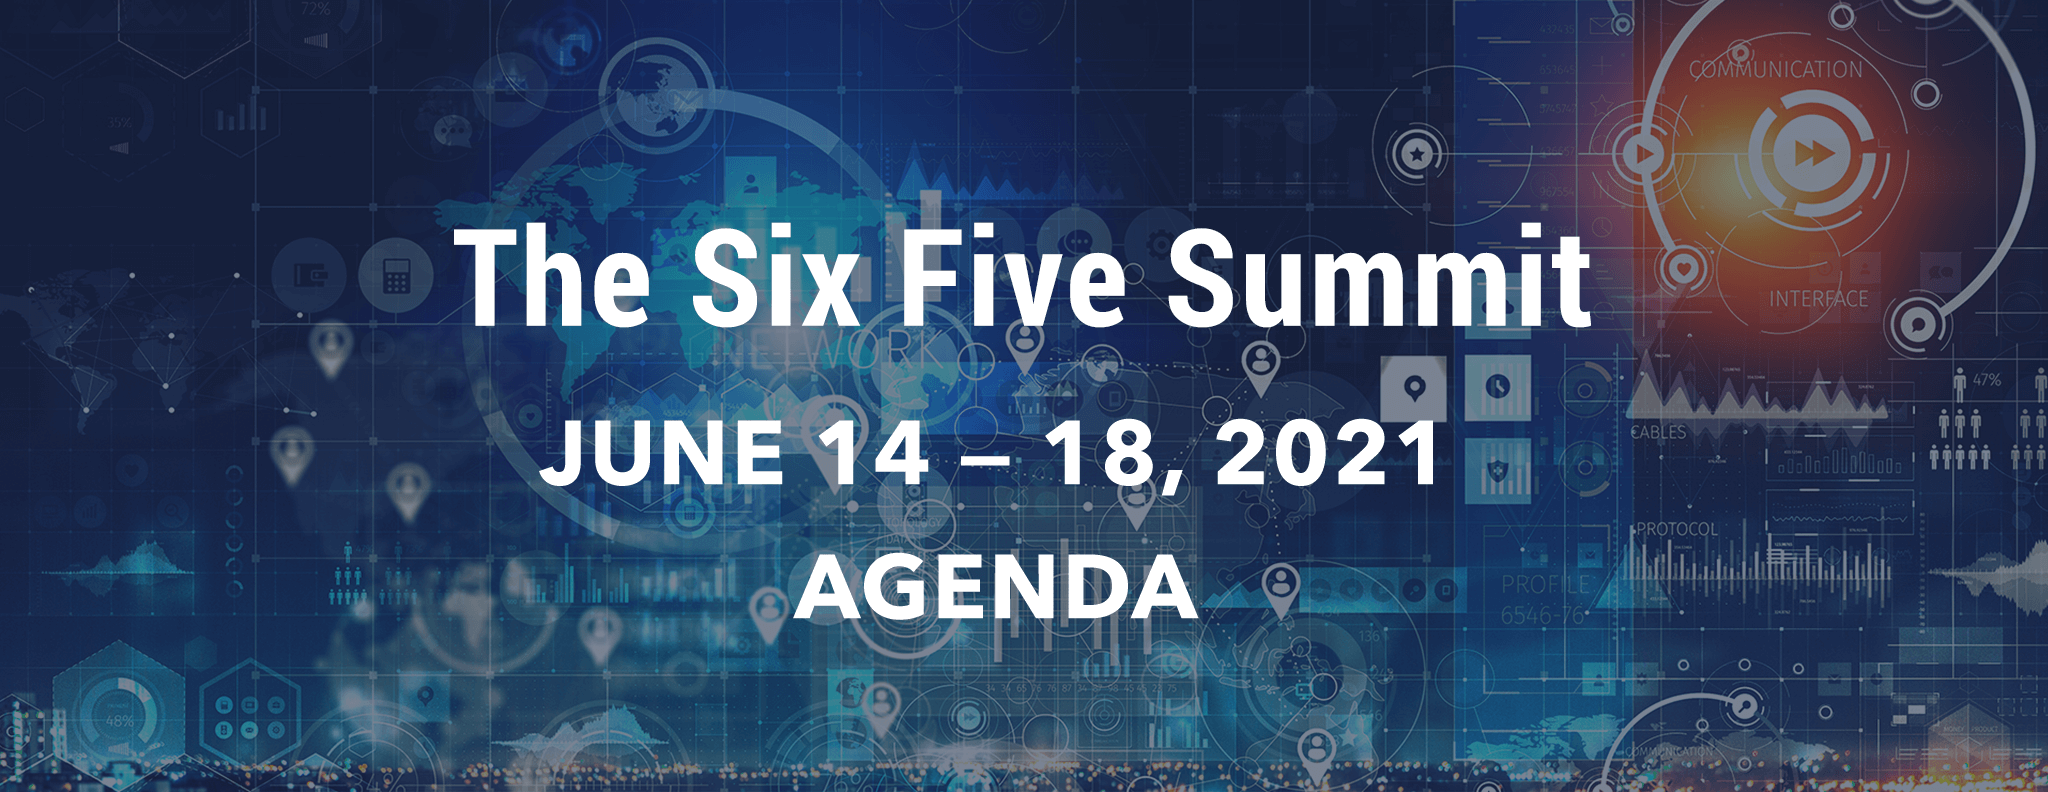 The Six Five Summit — Agenda